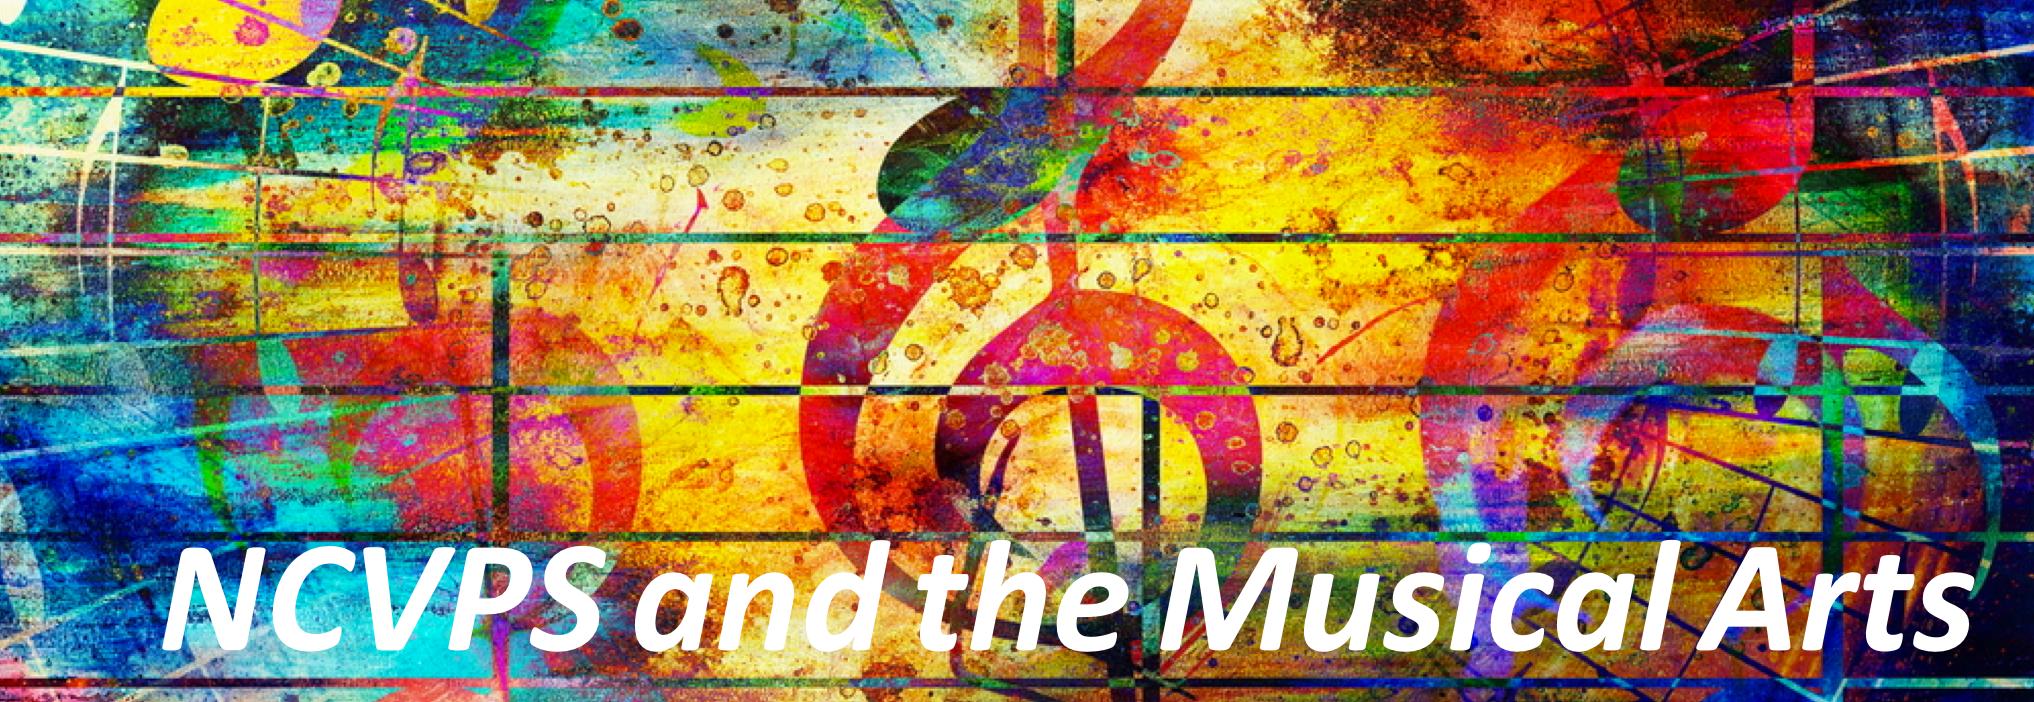 Musical Arts